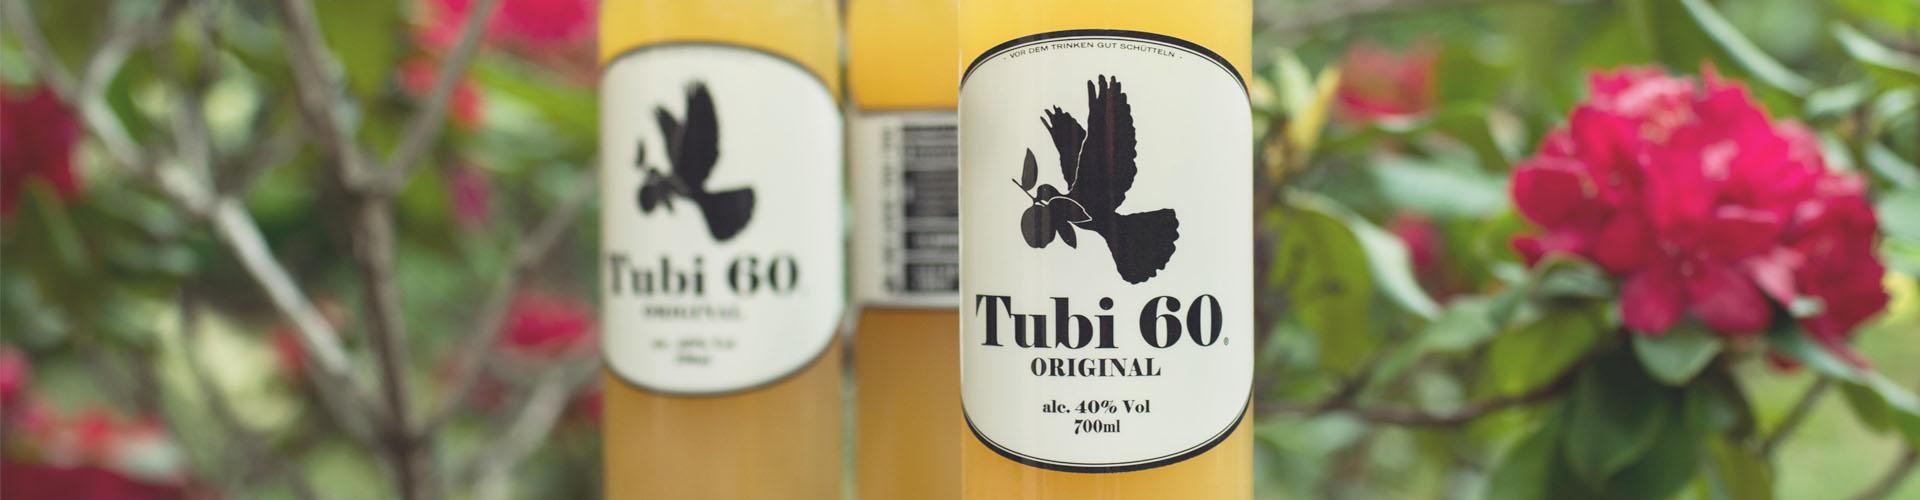 Tubi 60 - Winter Homepage